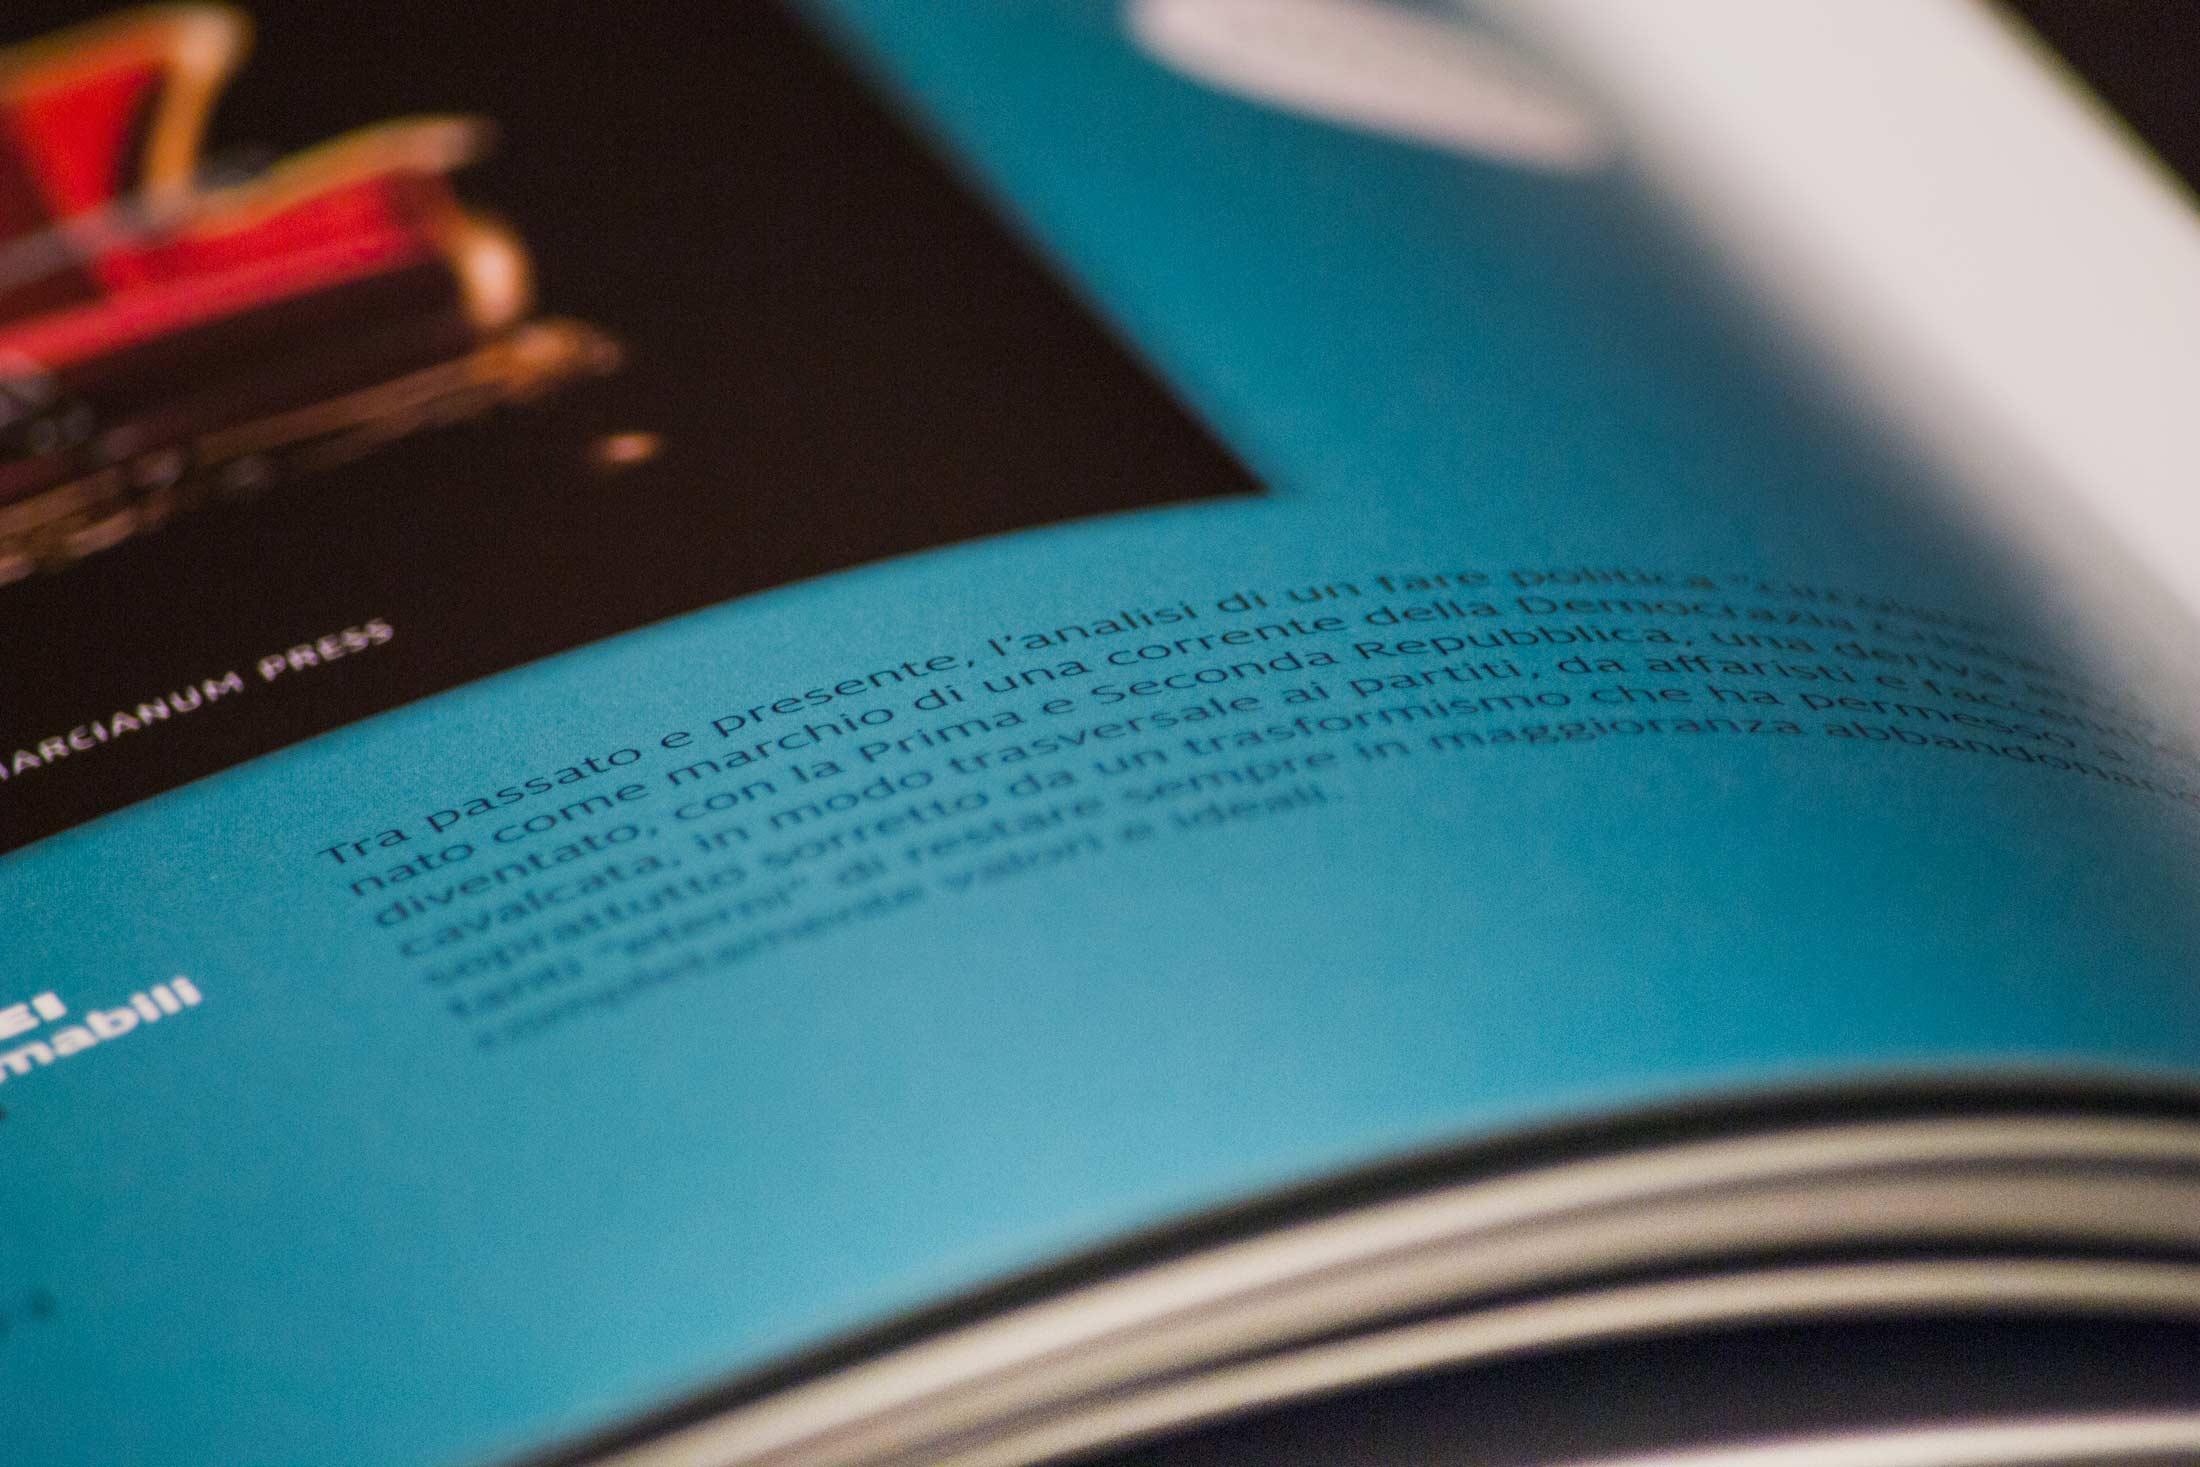 Catalogo Marcianum Press - particolare 1